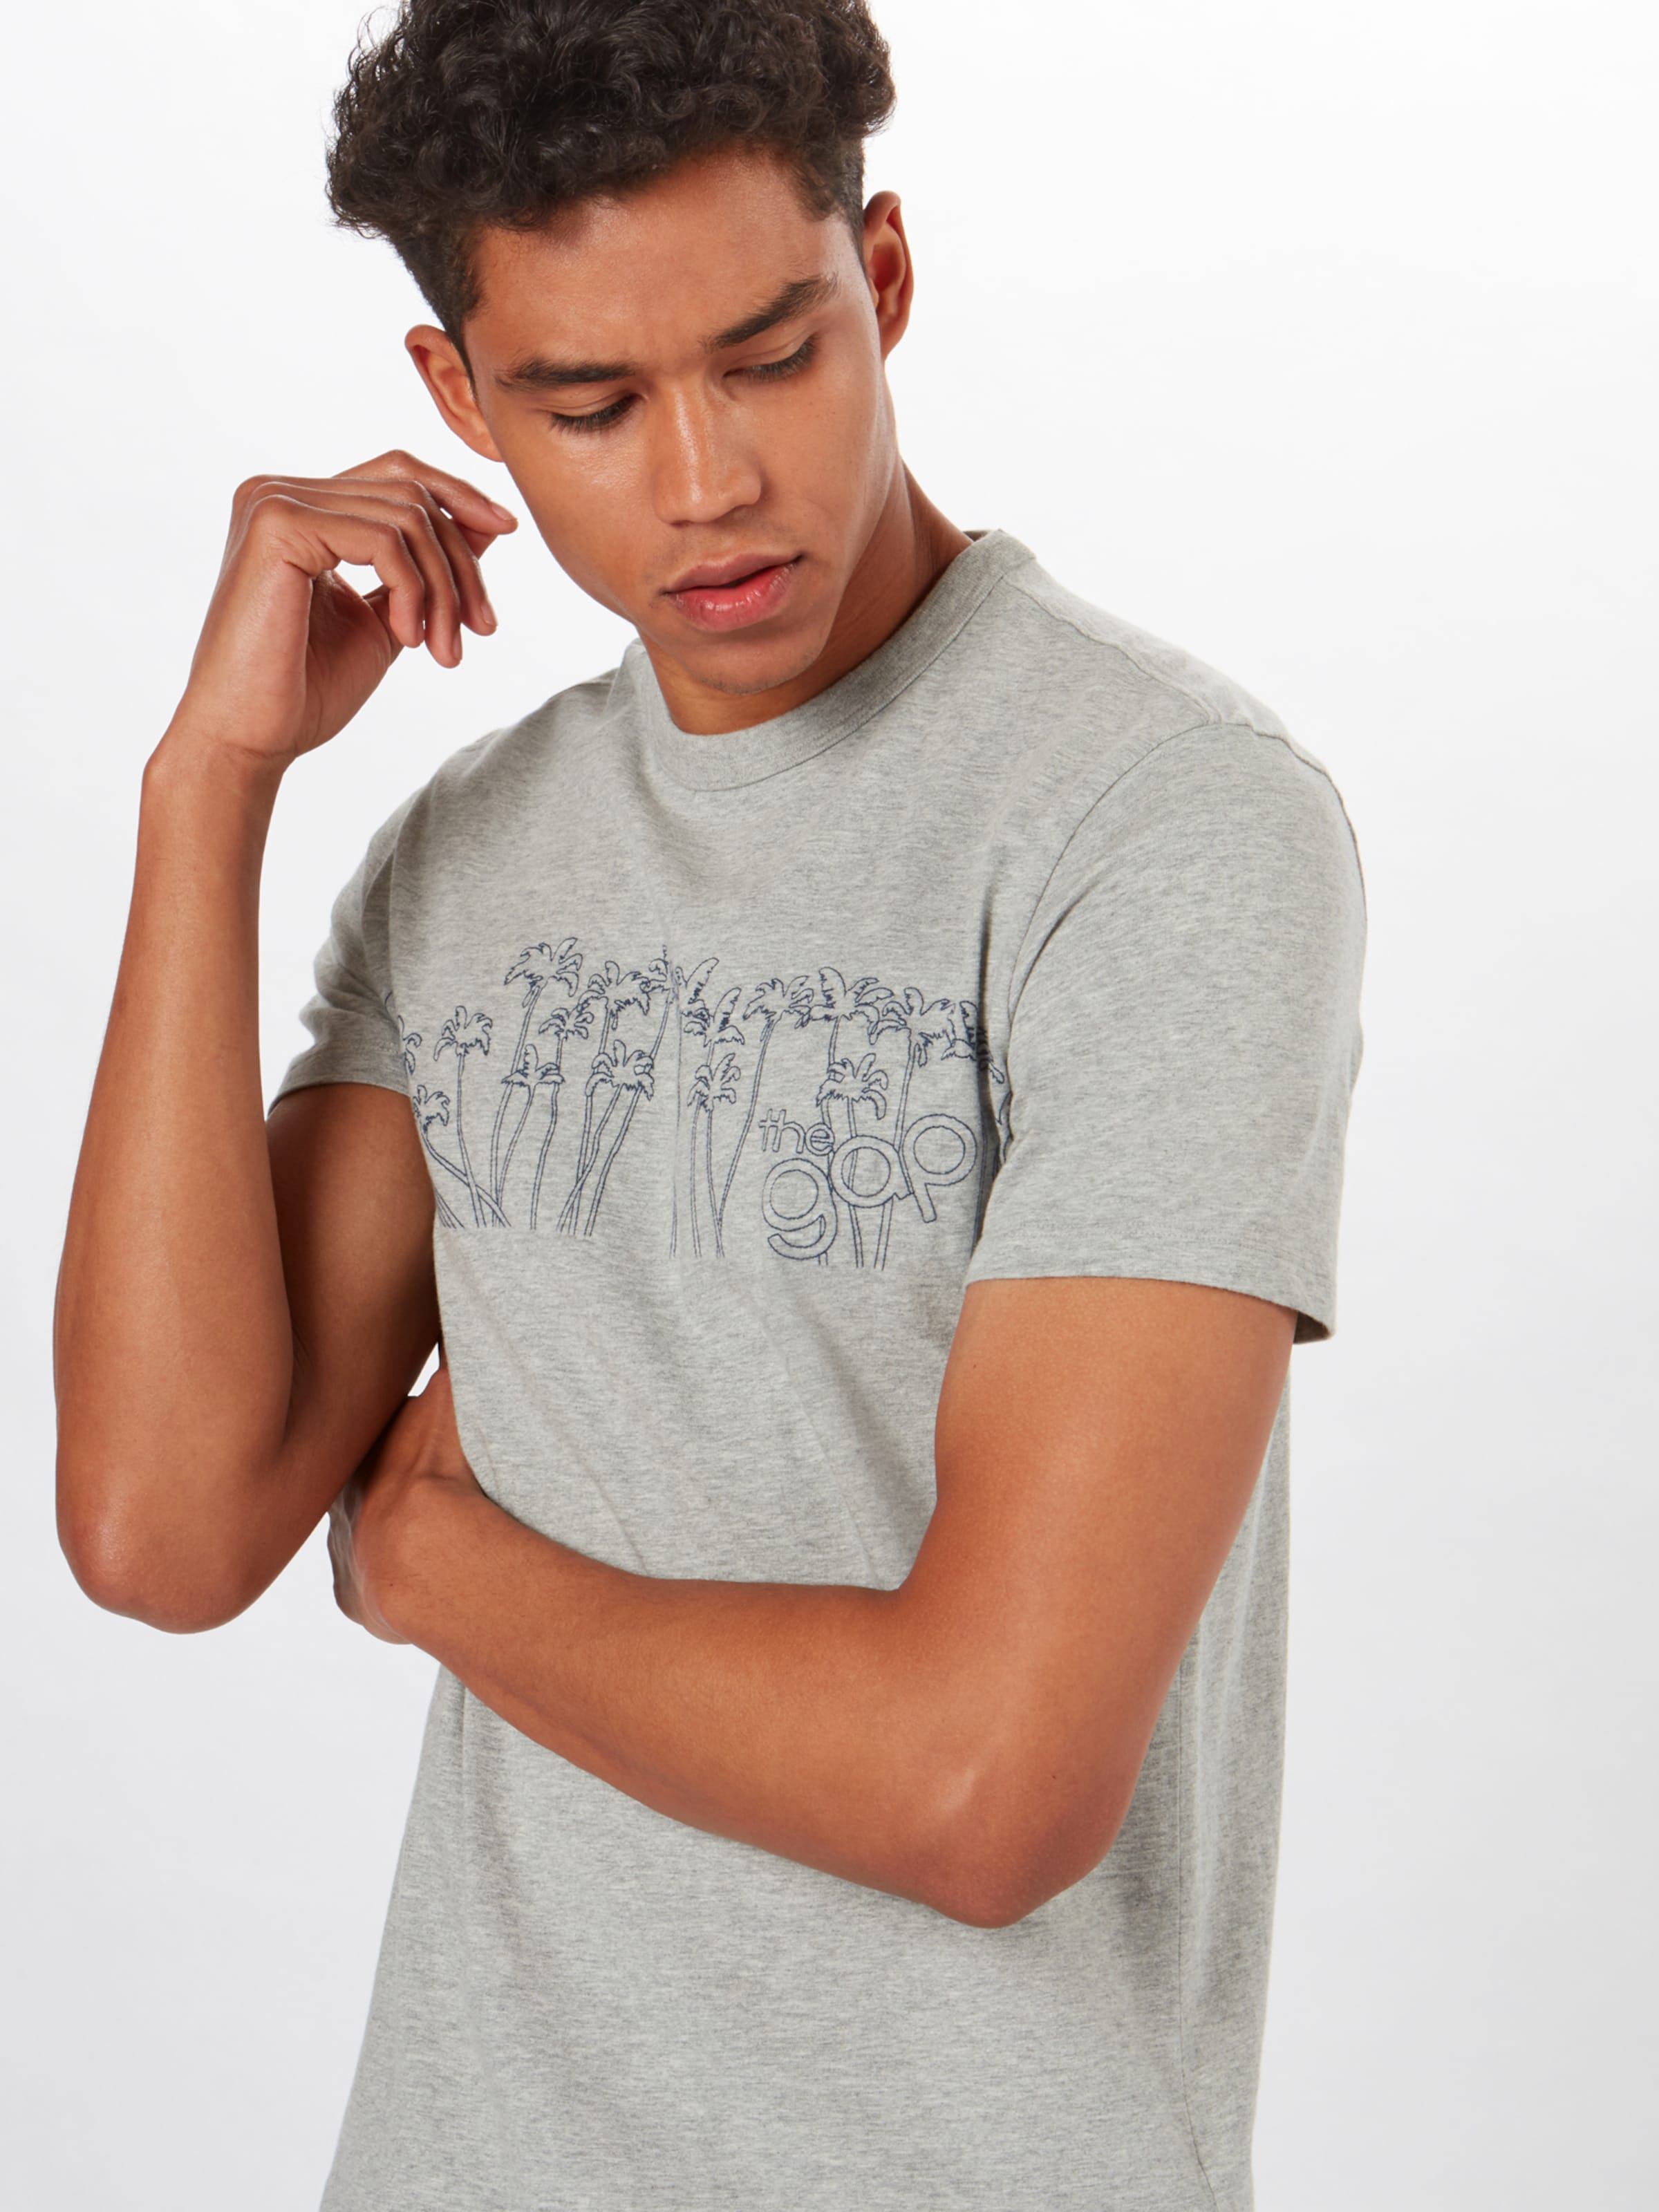 shirt En T 'palms' Indigo Gap k8nwO0NZPX